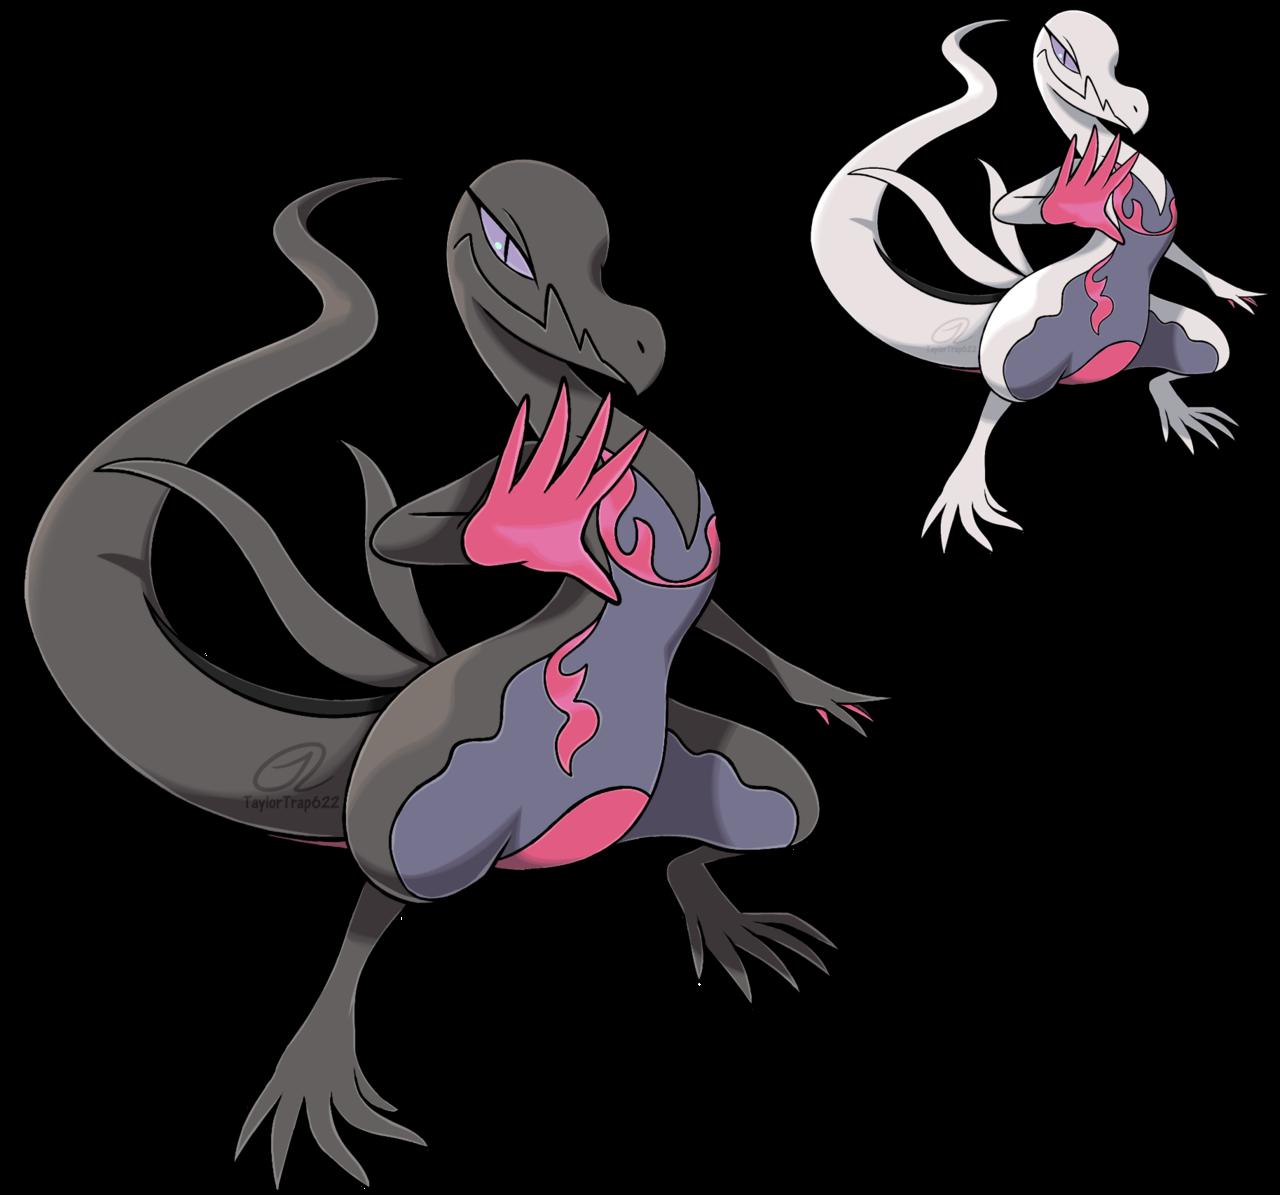 e926 duo female feral lizard nintendo pokémon reptile salazzle scalie shiny_pokémon simple_background taylortrap622 video_games